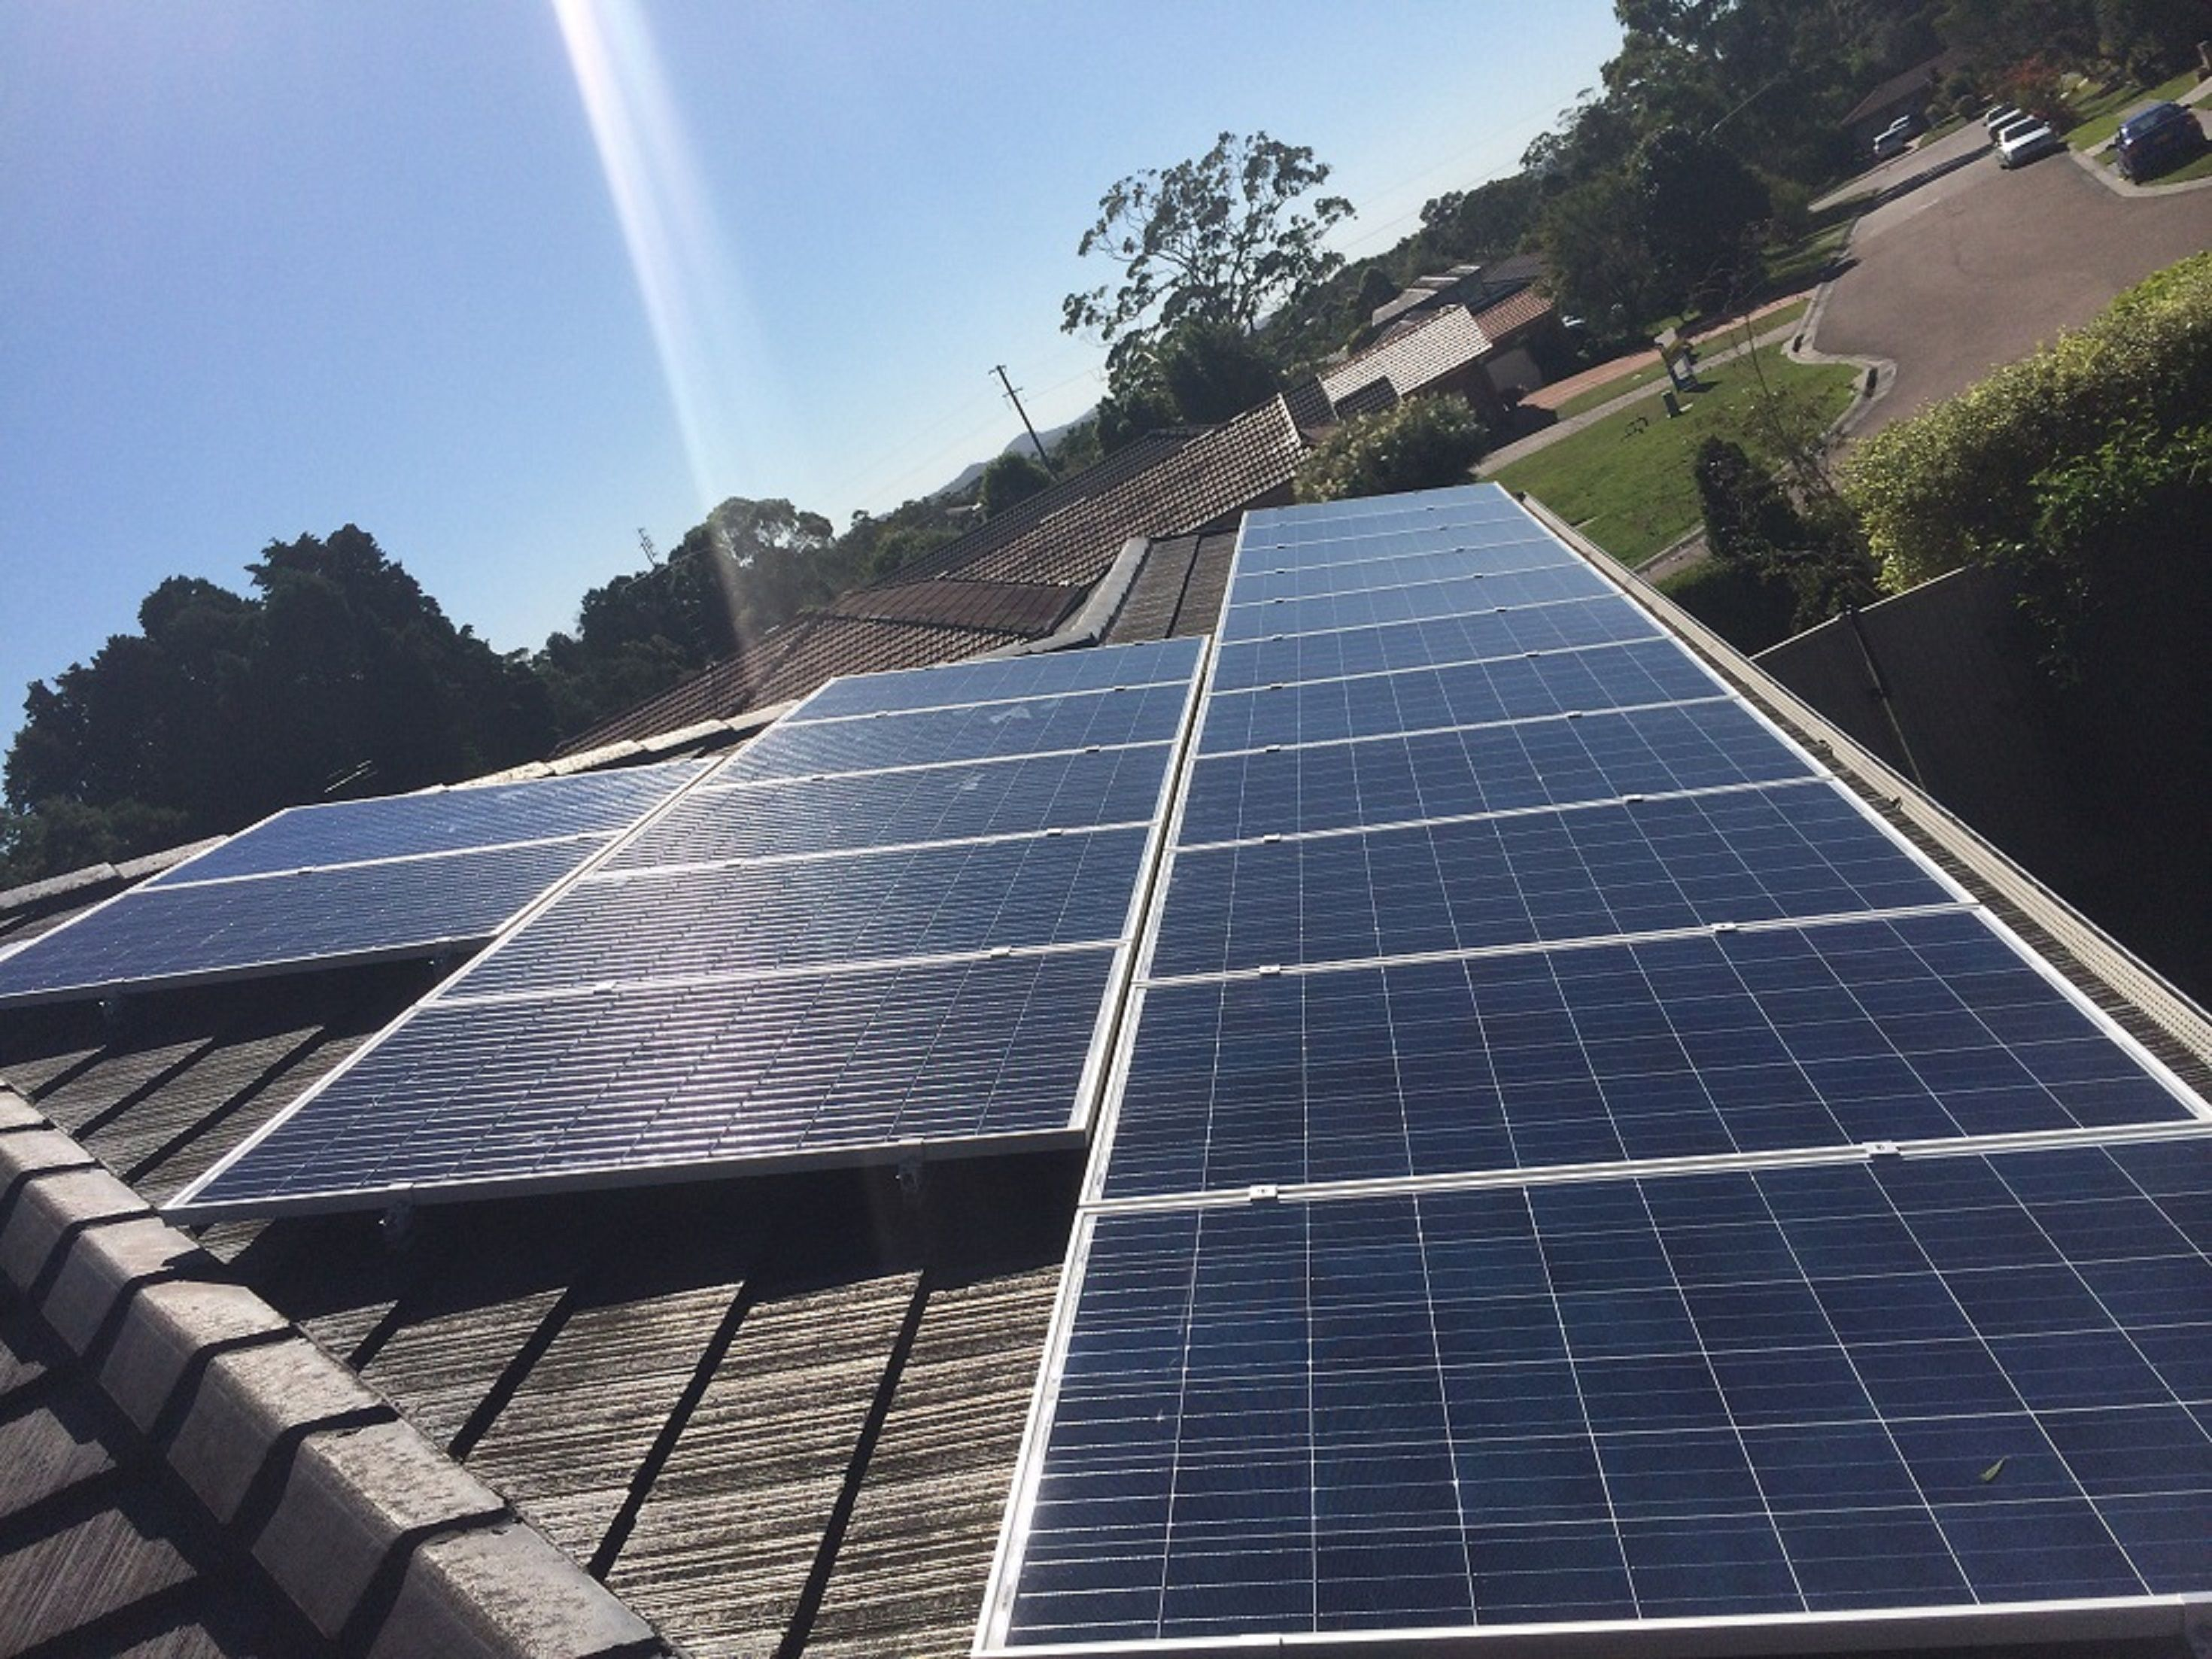 4kw Solar System Price 4kw Solar Panels Price Cost May 23 2018 Solar Panels Solar Power System Residential Solar Panels